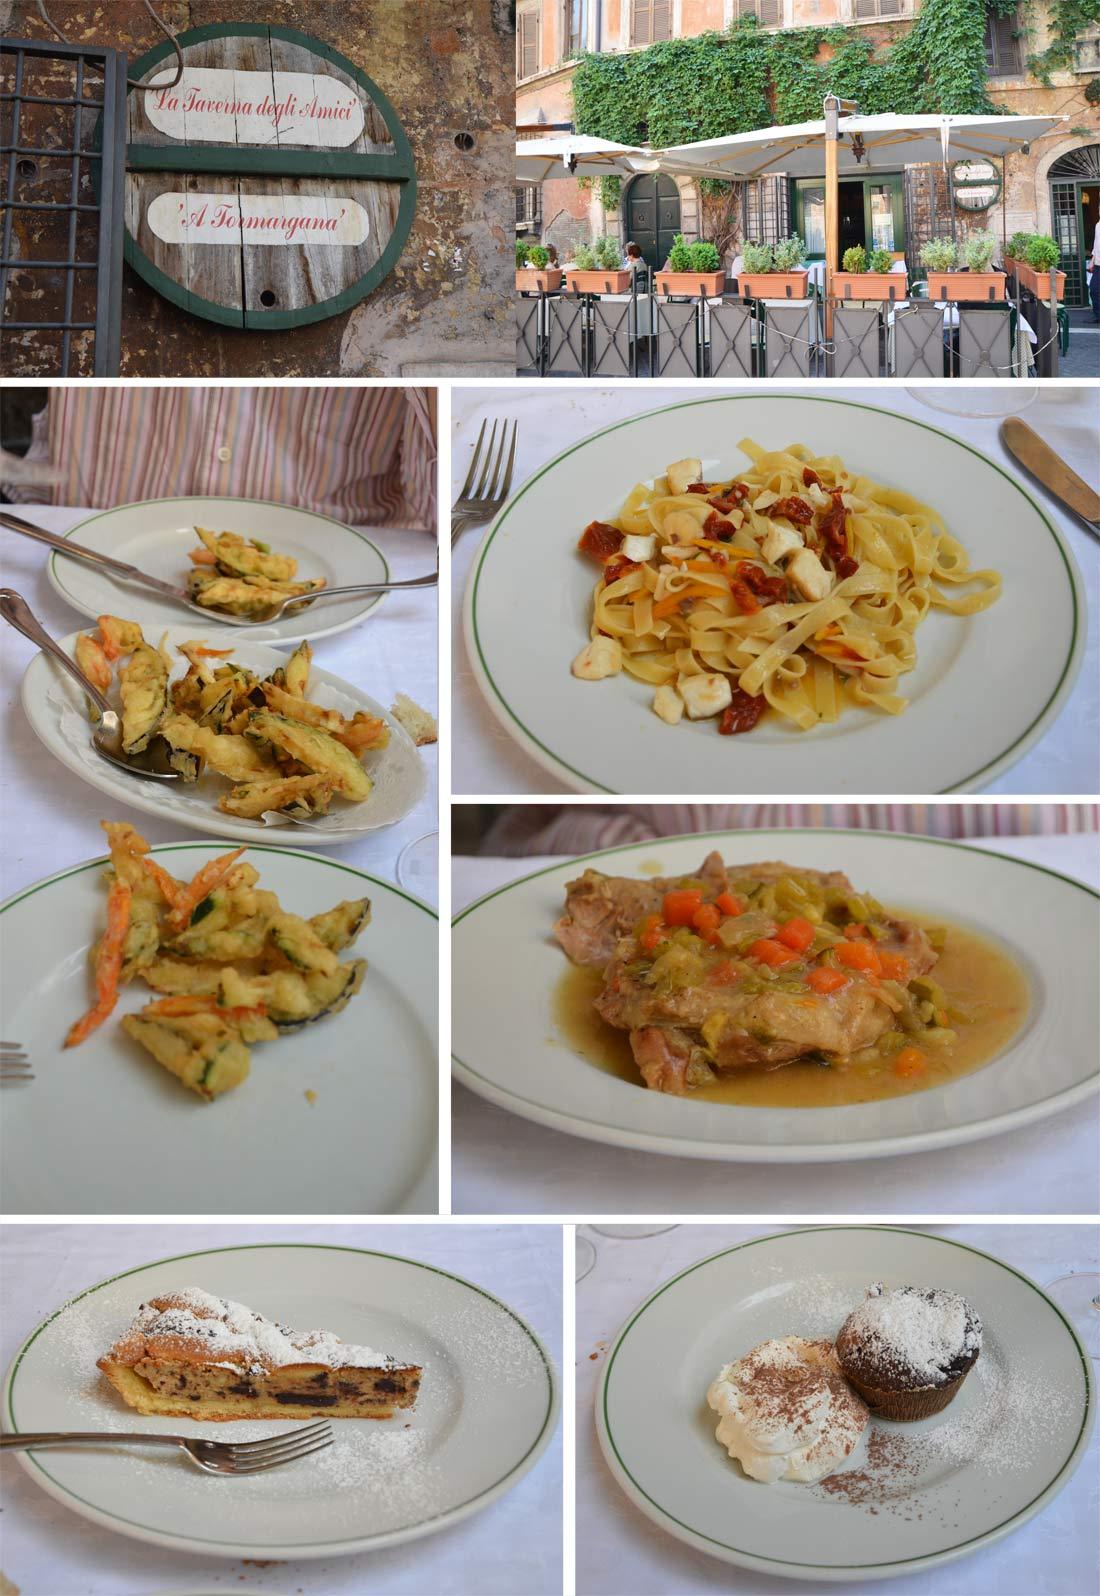 Taverna dei amigli, mes adresses gourmandes à Rome